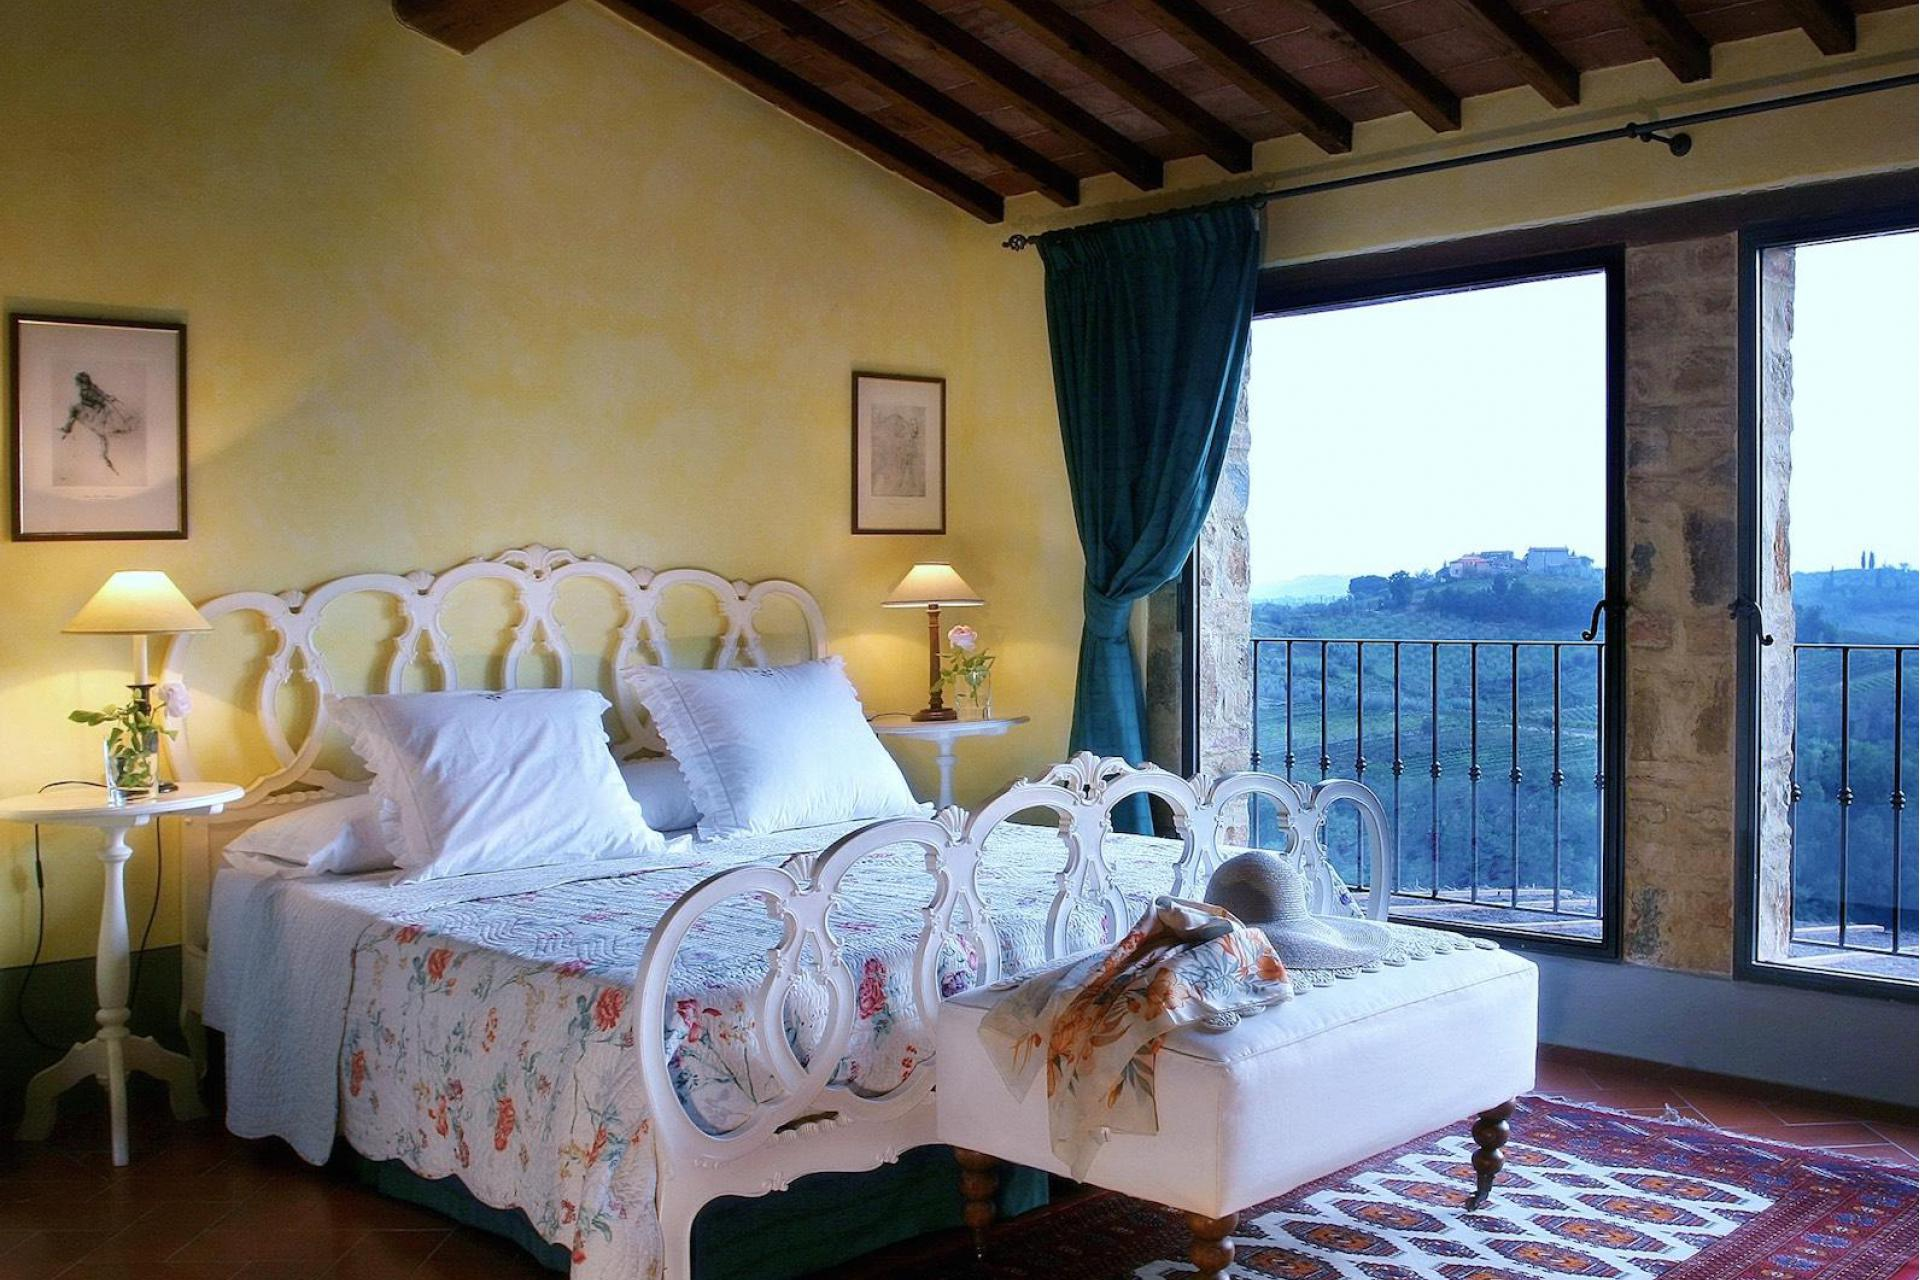 Agriturismo Toscana Agriturismo Toscana in uliveto con vista mozzafiato